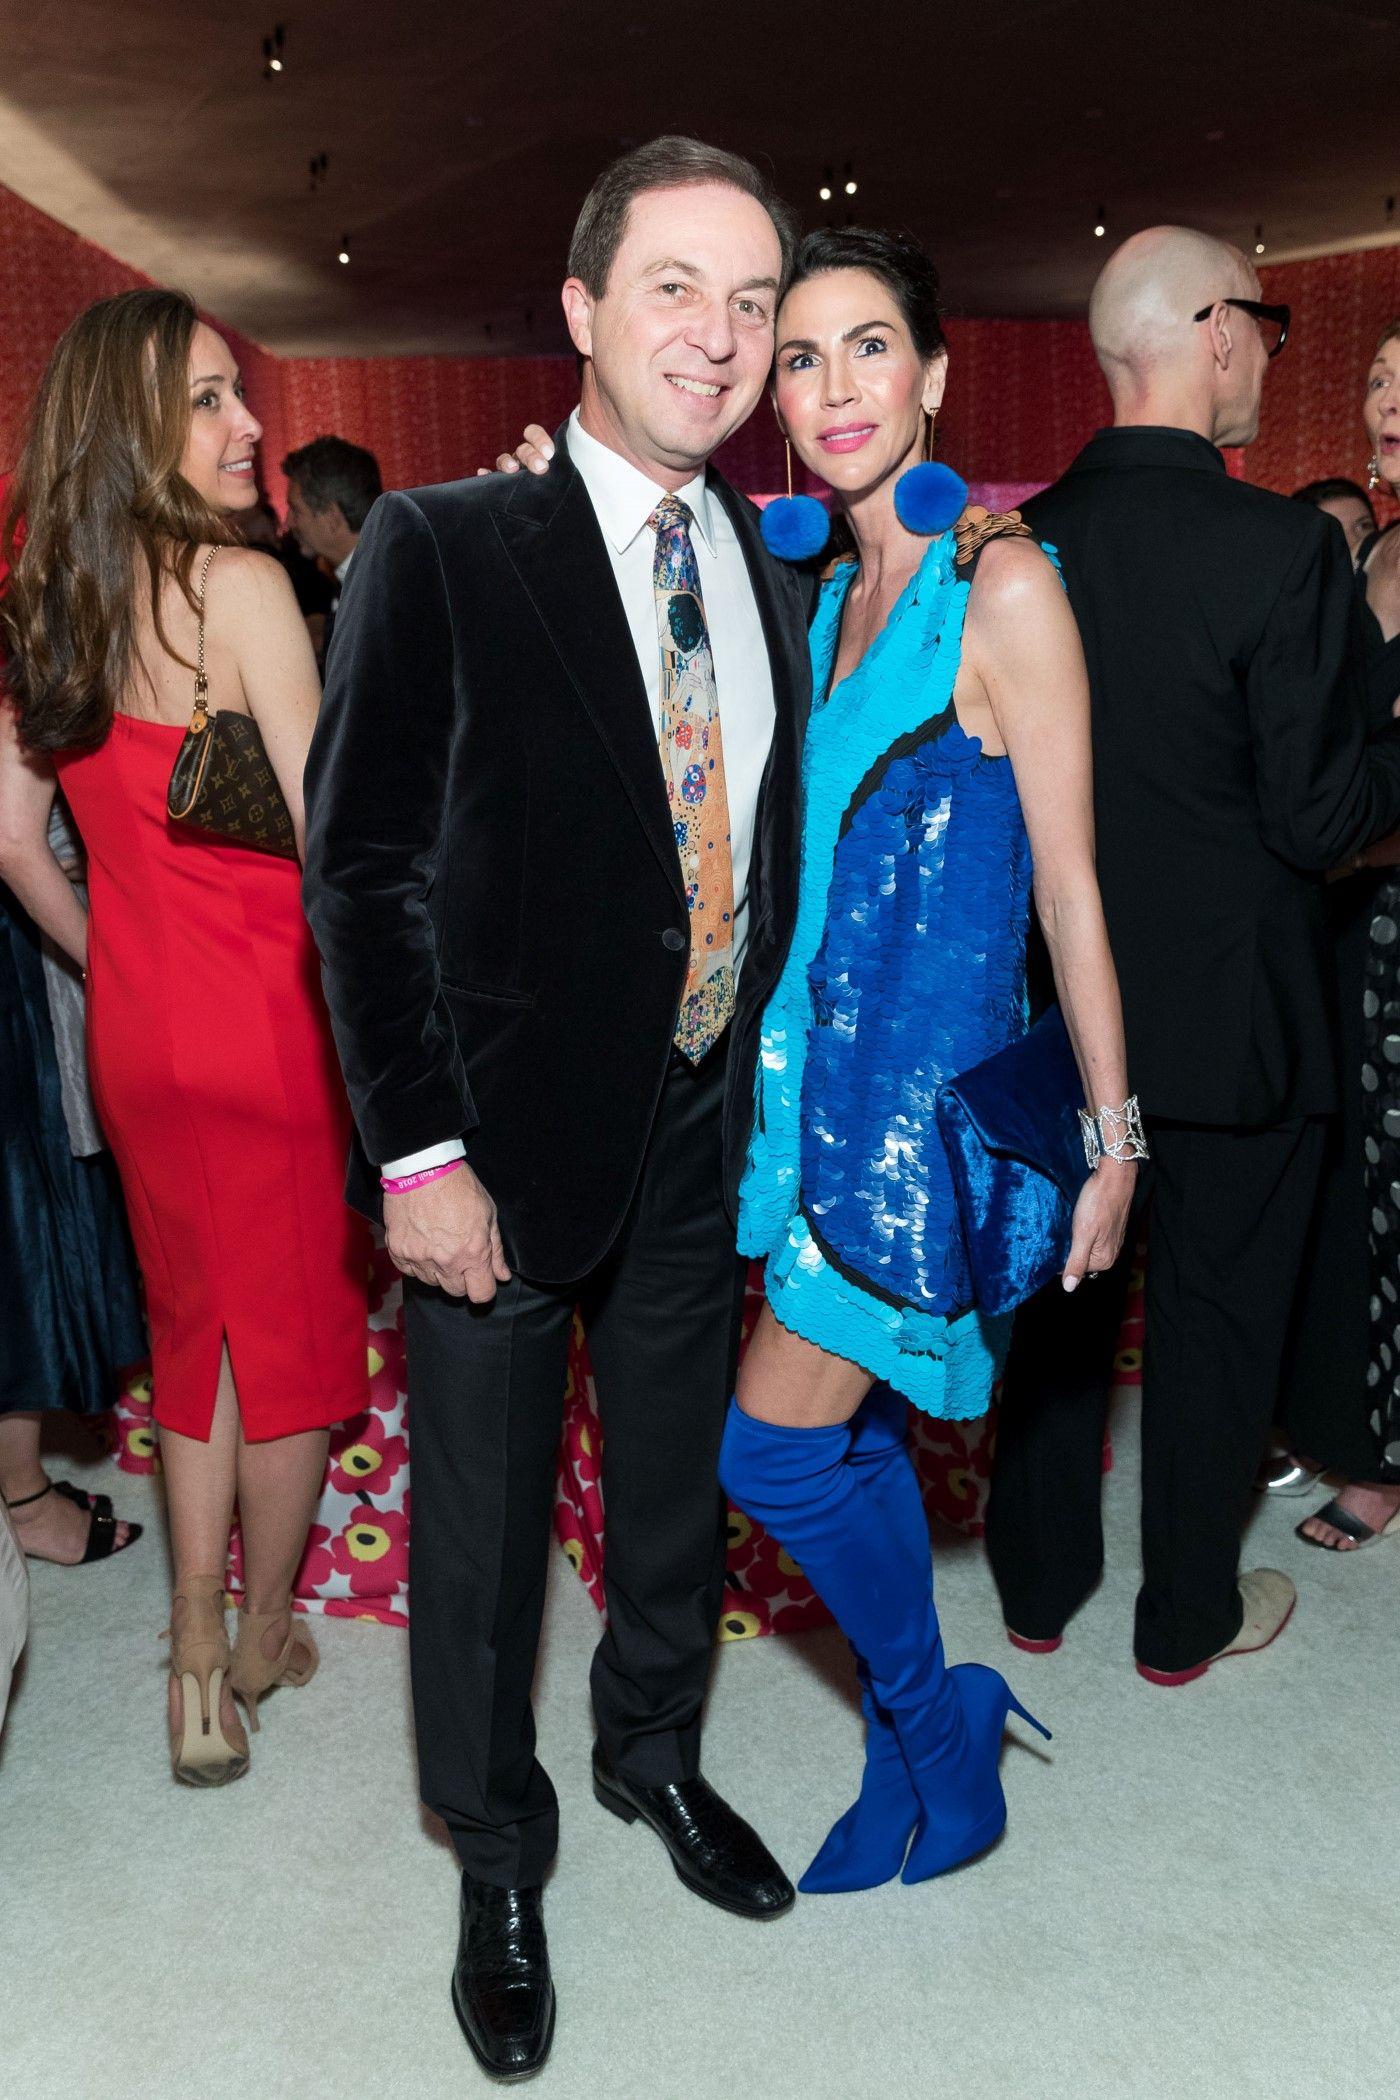 Joe Lacob and Nicole Curran